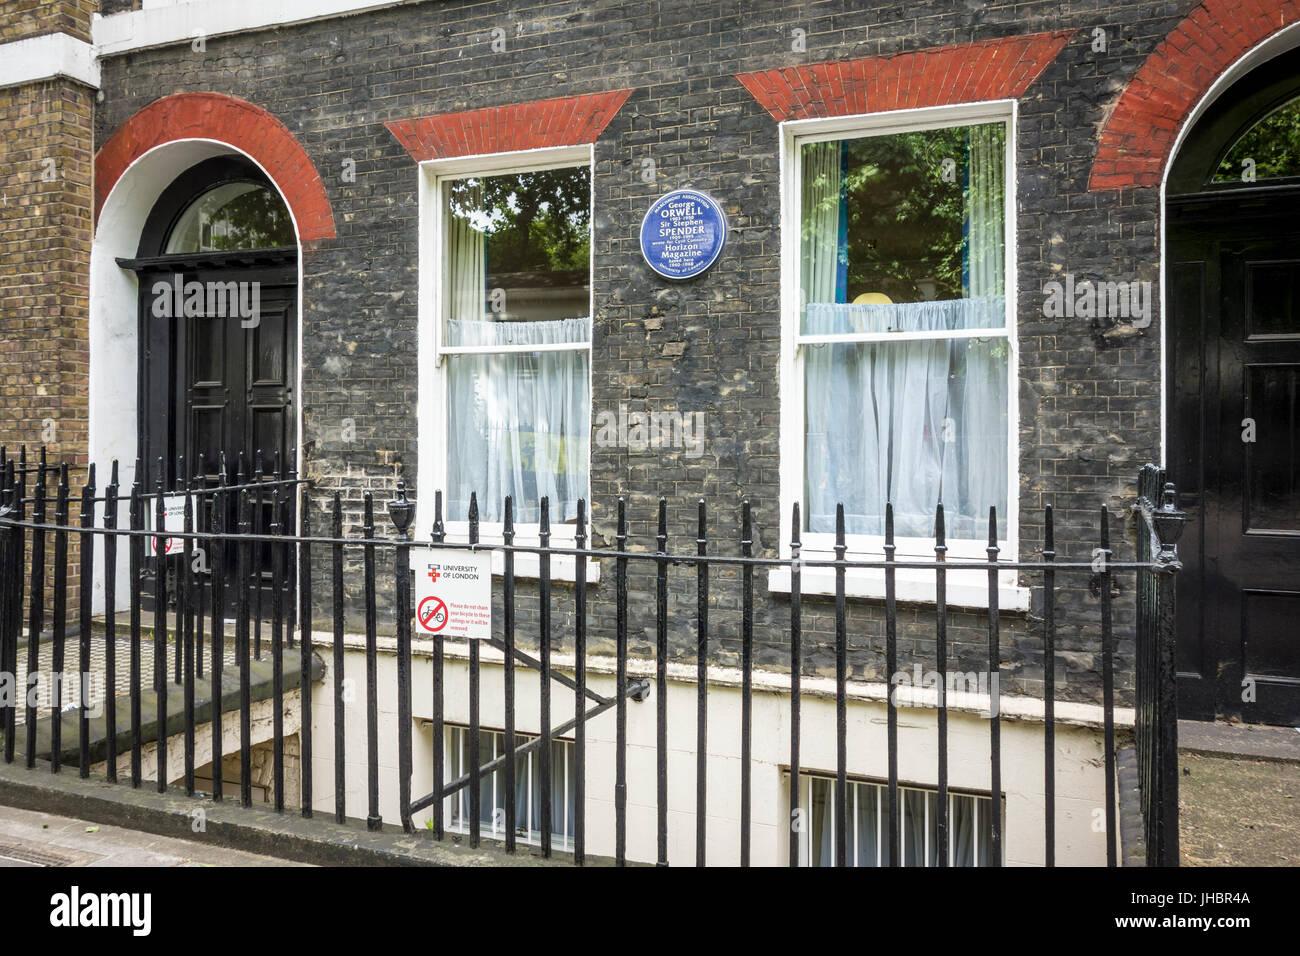 Blue plaque, George Orwell, Sir Stephen Spender, Horizon Magazine, Lansdowne Terrace, London, UK - Stock Image